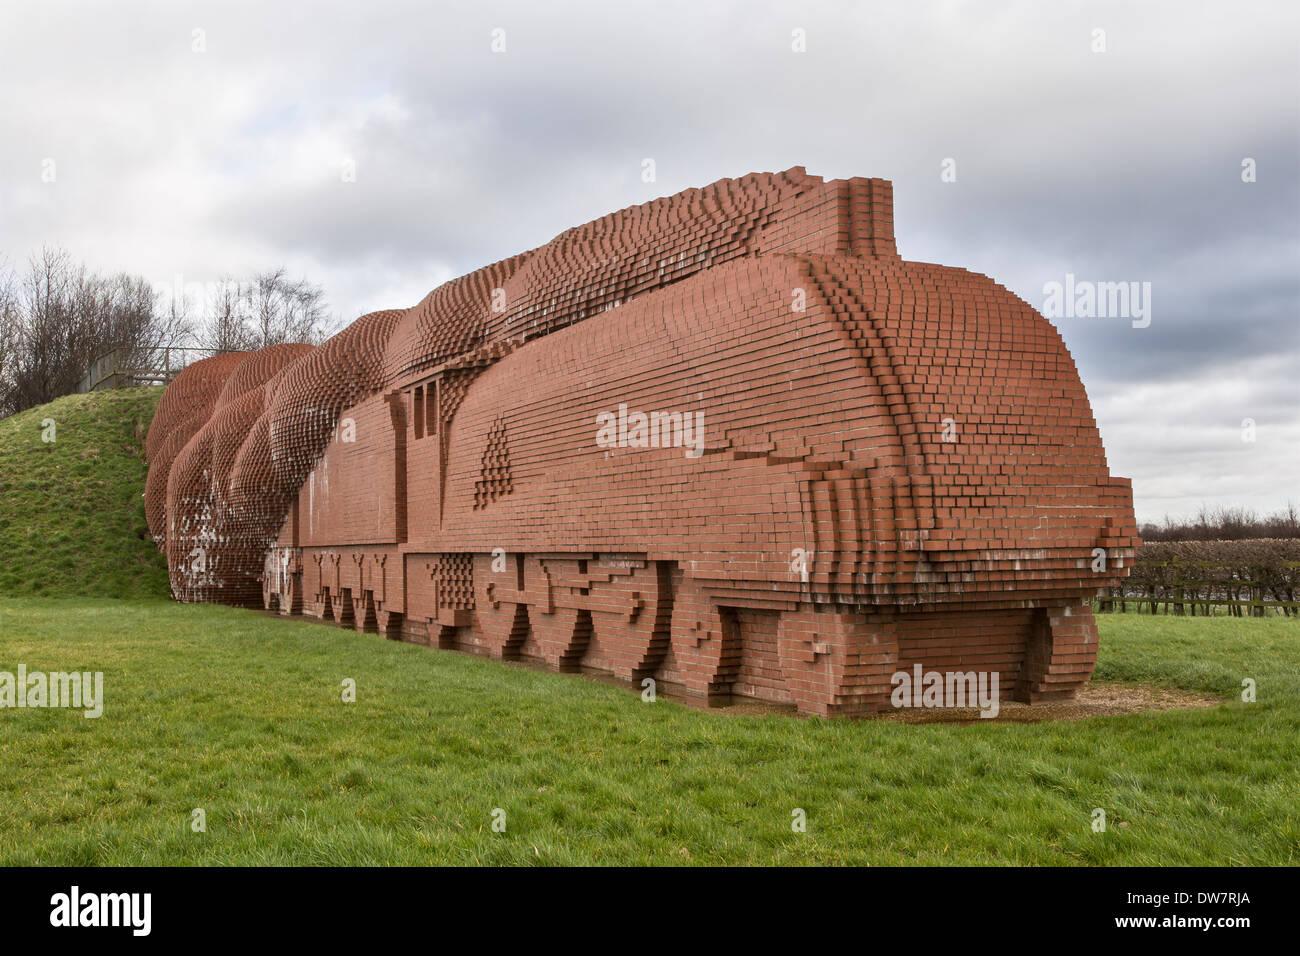 The Brick Train, Darlington, by sculptor David Mack, completed 1997. Modelled on steam locomotive 'Mallard' - Stock Image